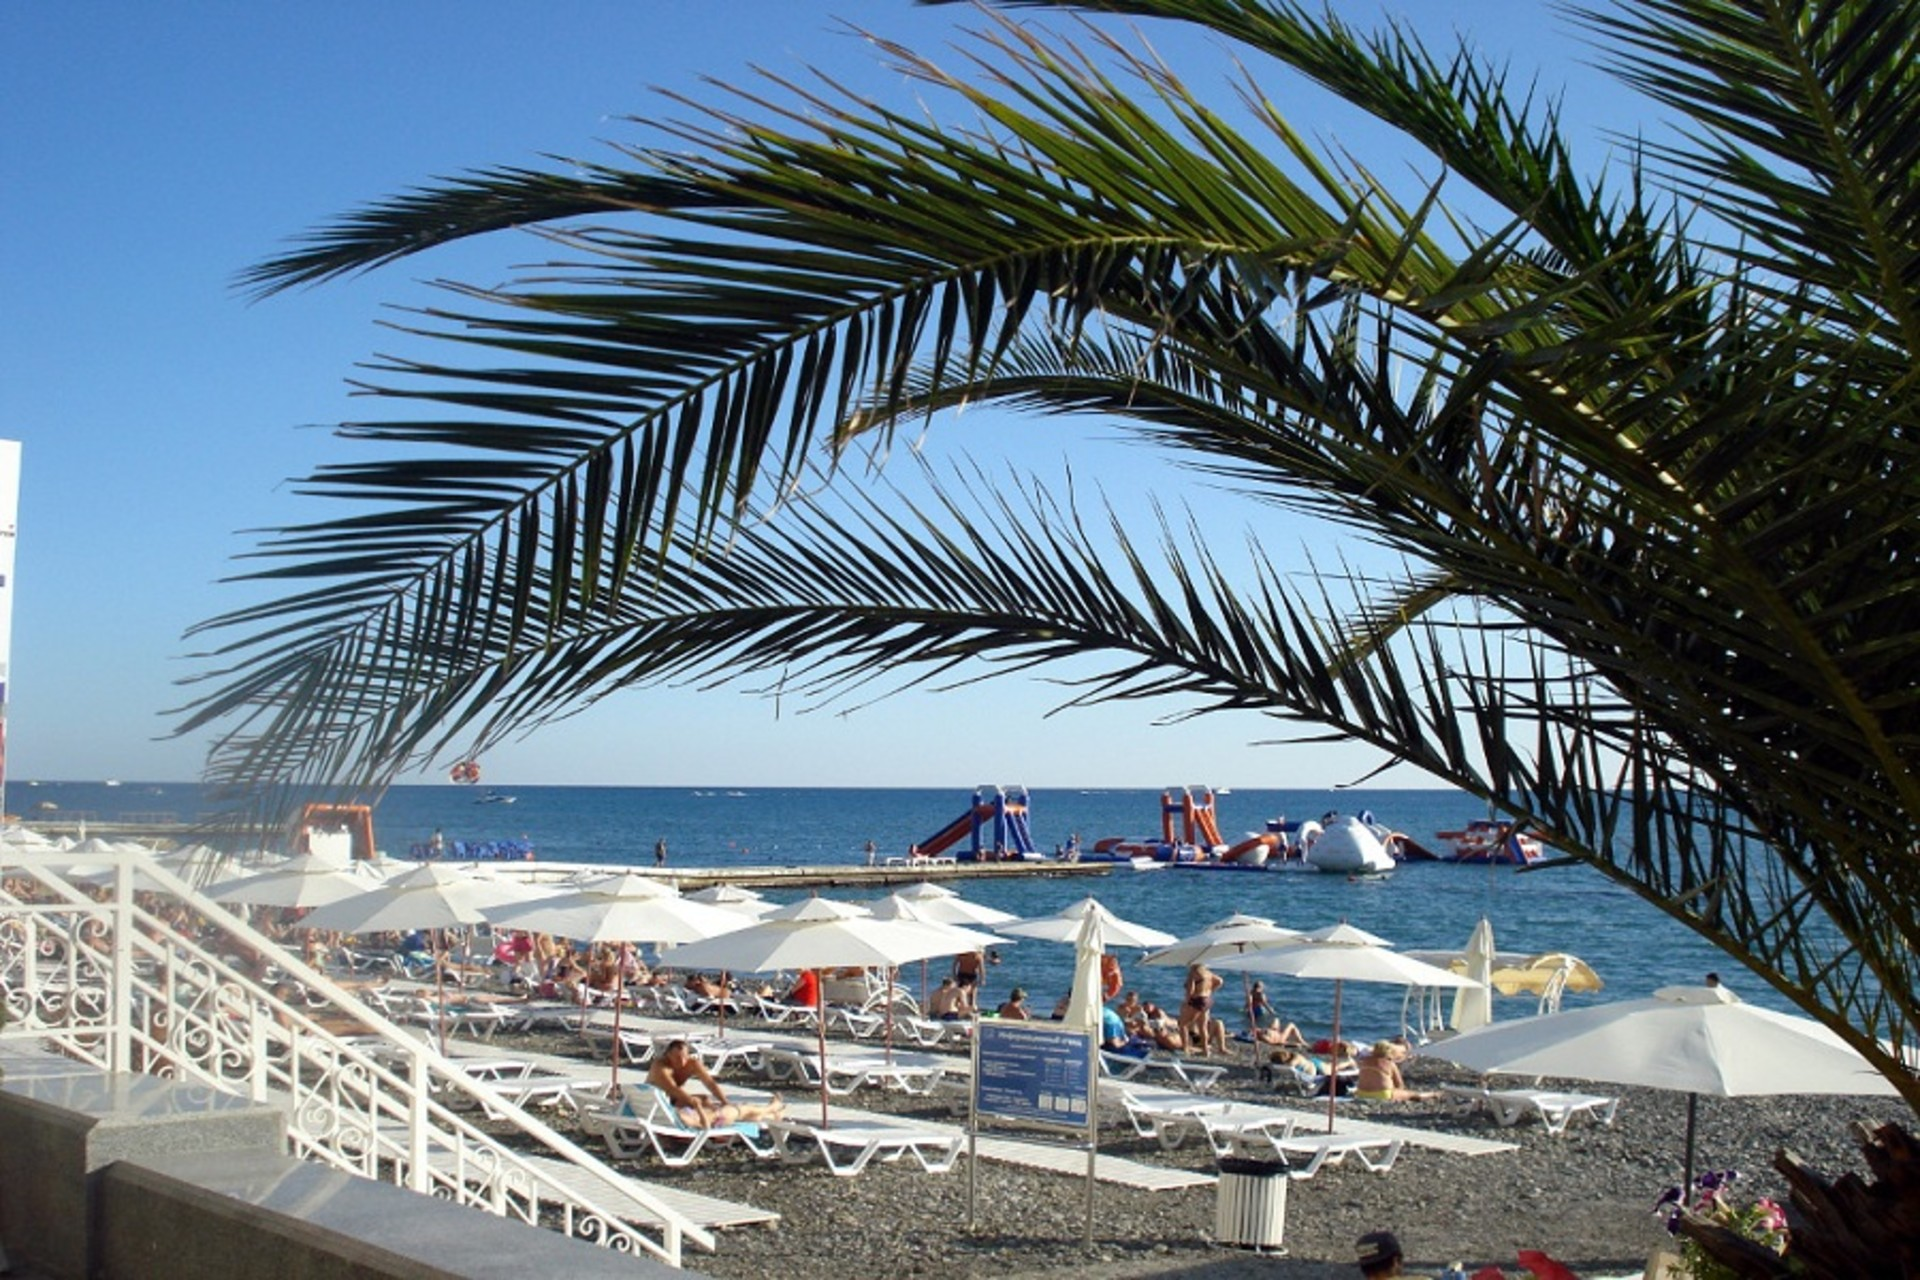 Best-beaches-Sochi-02.jpg